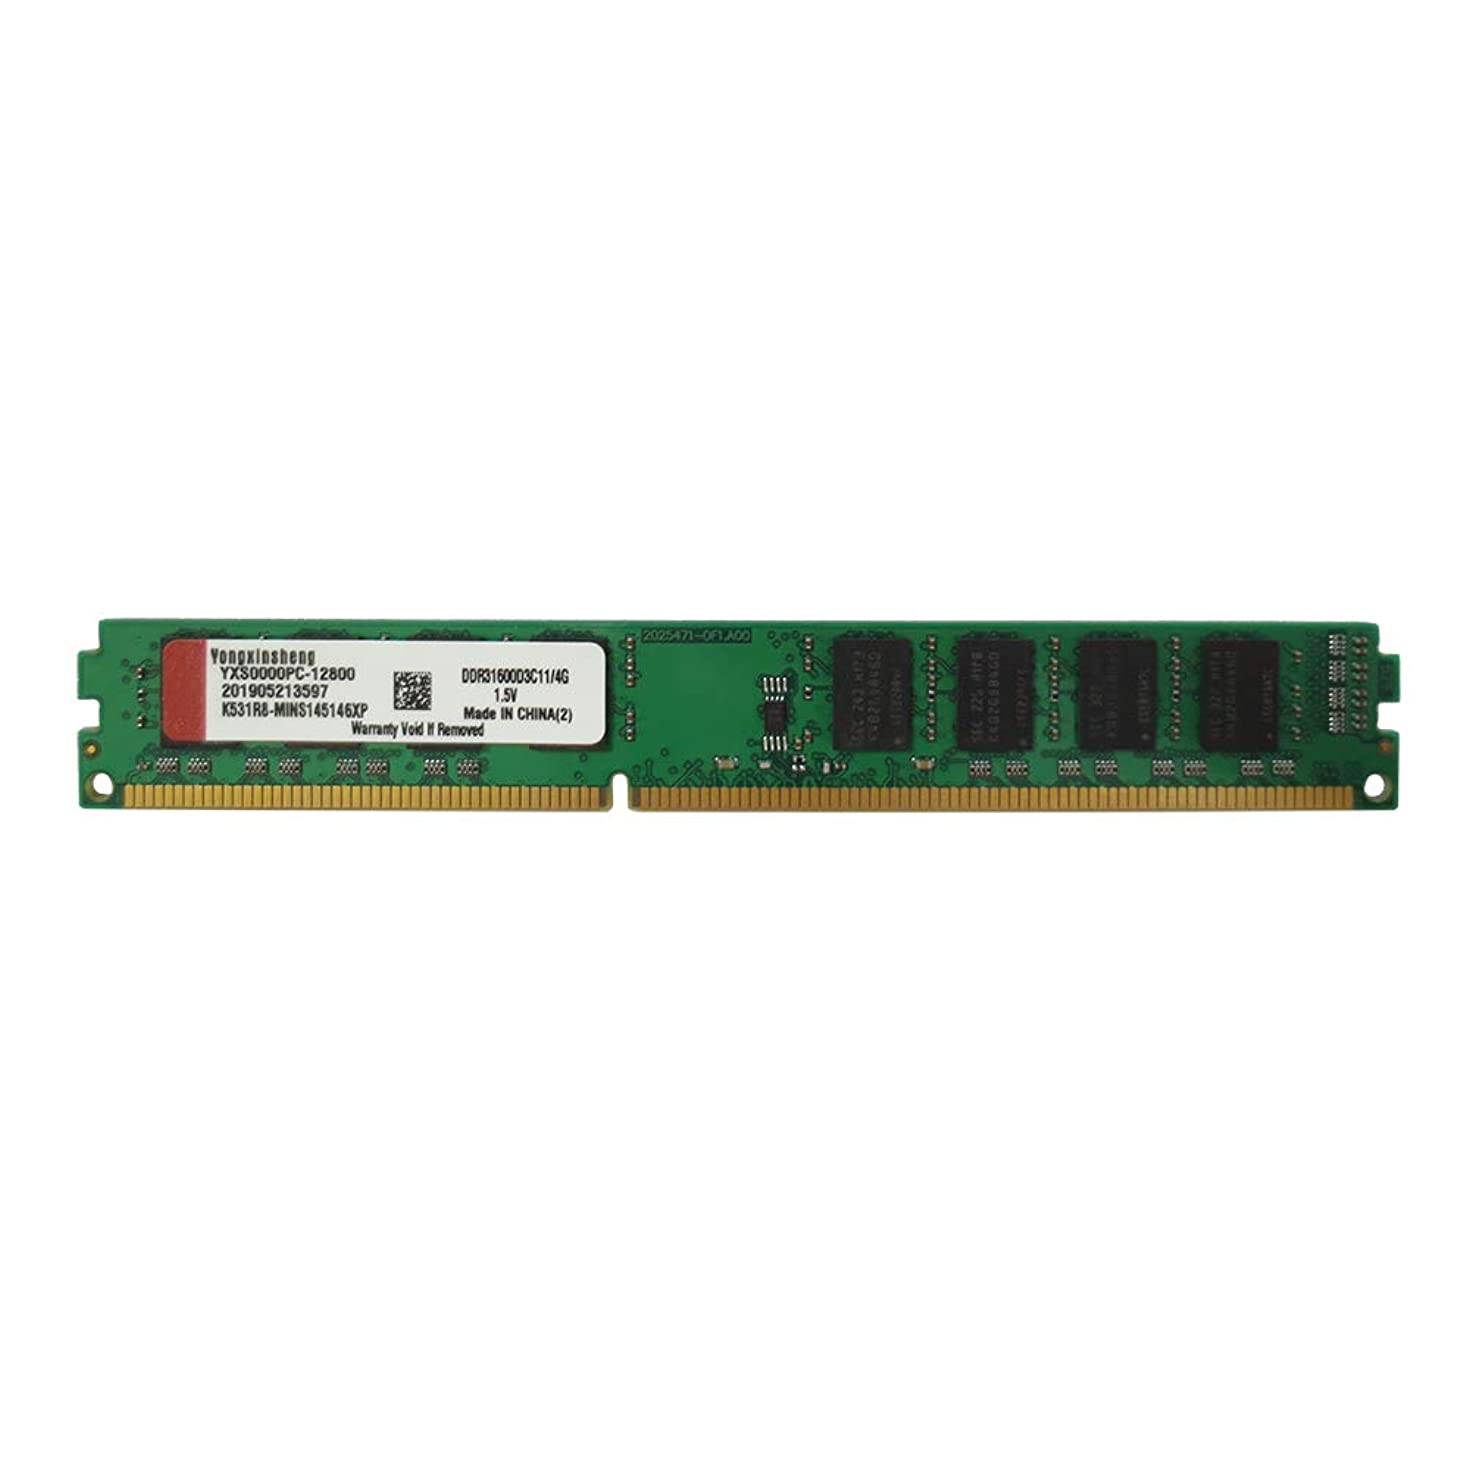 Yongxinsheng DDR3 8GB 1600Mhz Desktop General Memory Ram (8G, 1600Mhz)